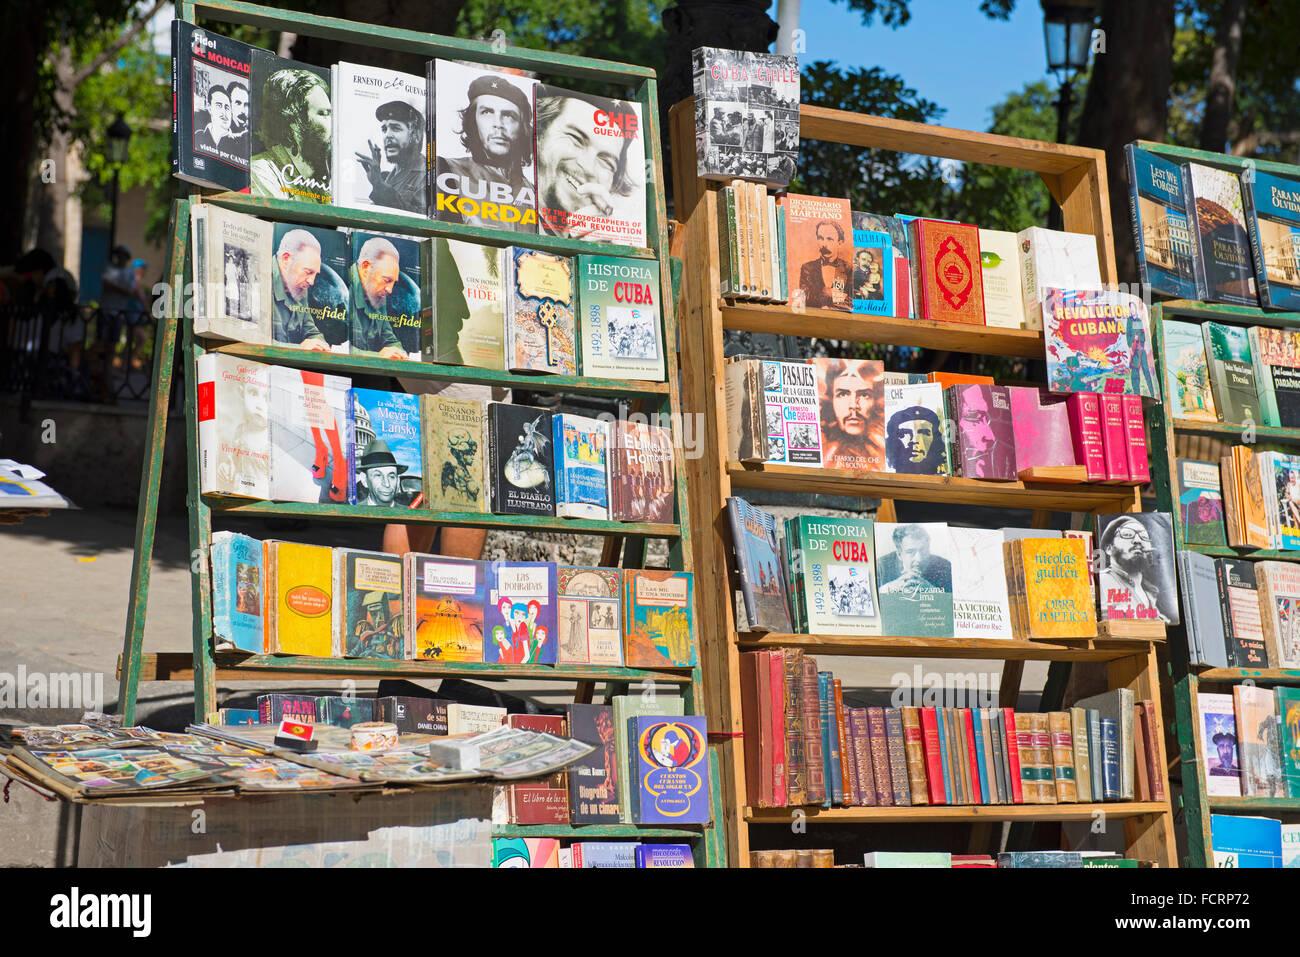 Che Guevara Fidel Castro, Bücher über, zum Verkauf an der Plaza de Armas, Havanna-Kuba Stockbild